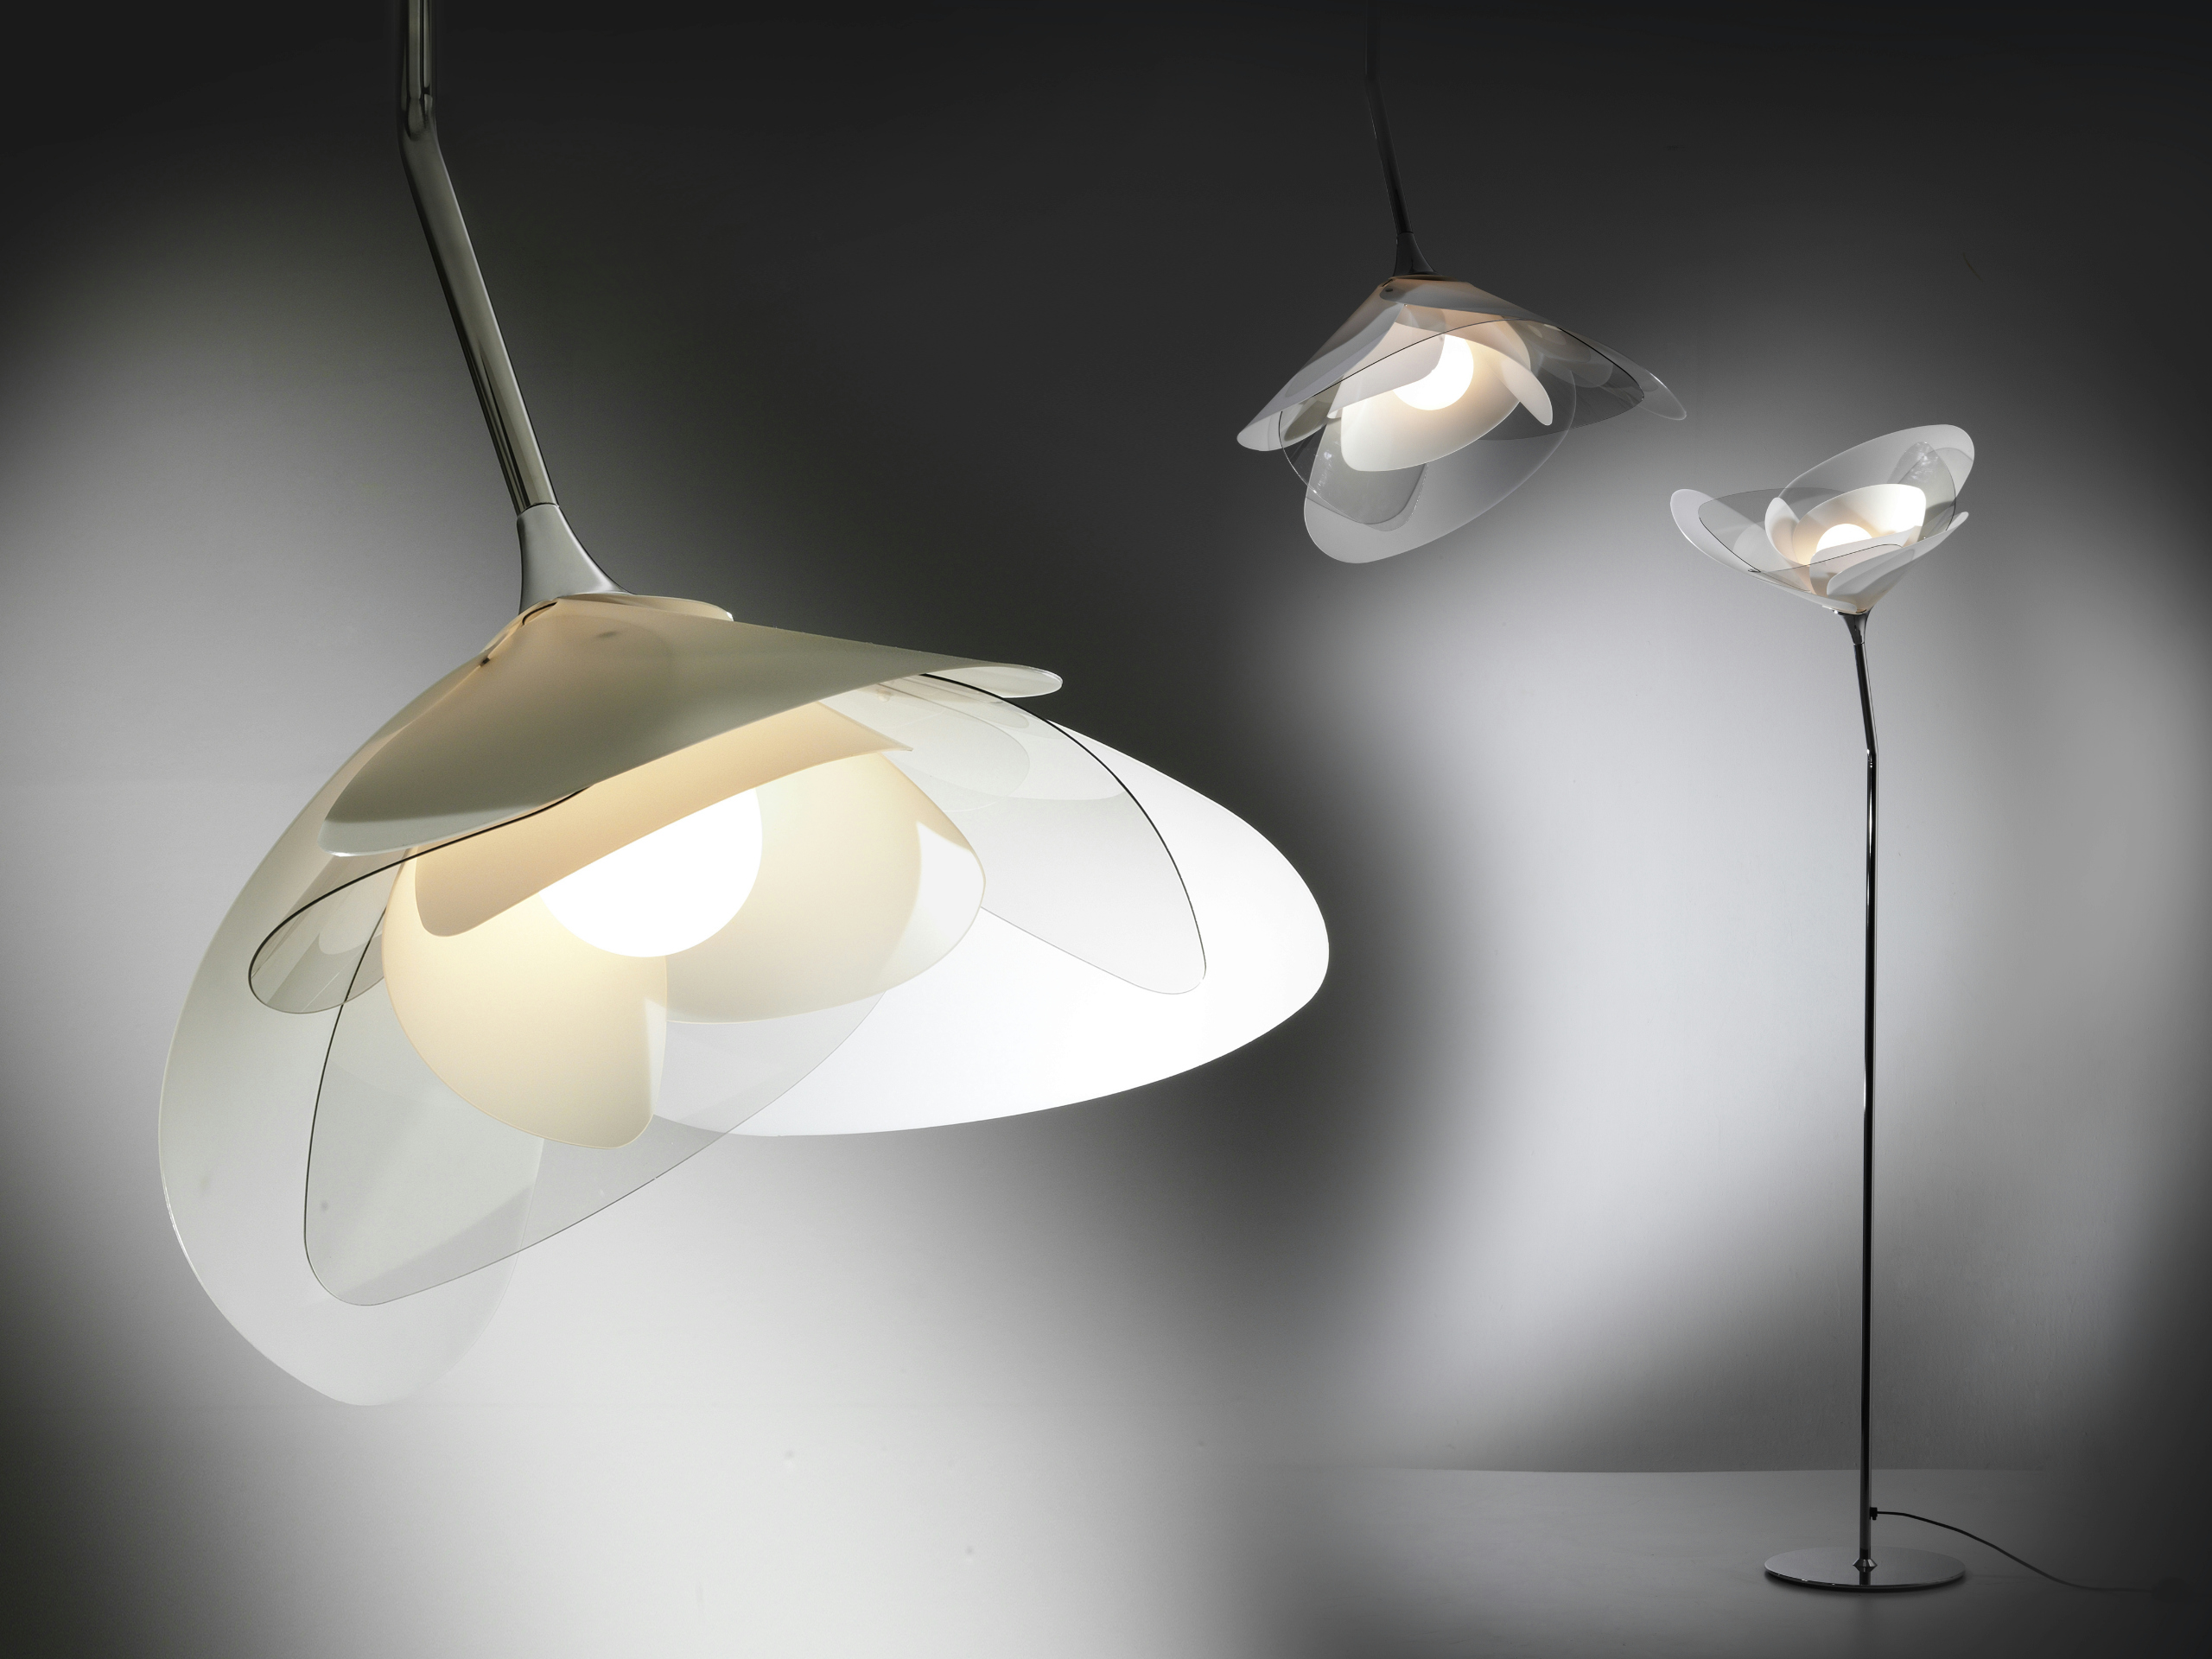 GIRAFIORE Lampada a sospensione by Slamp design Elodie Longo